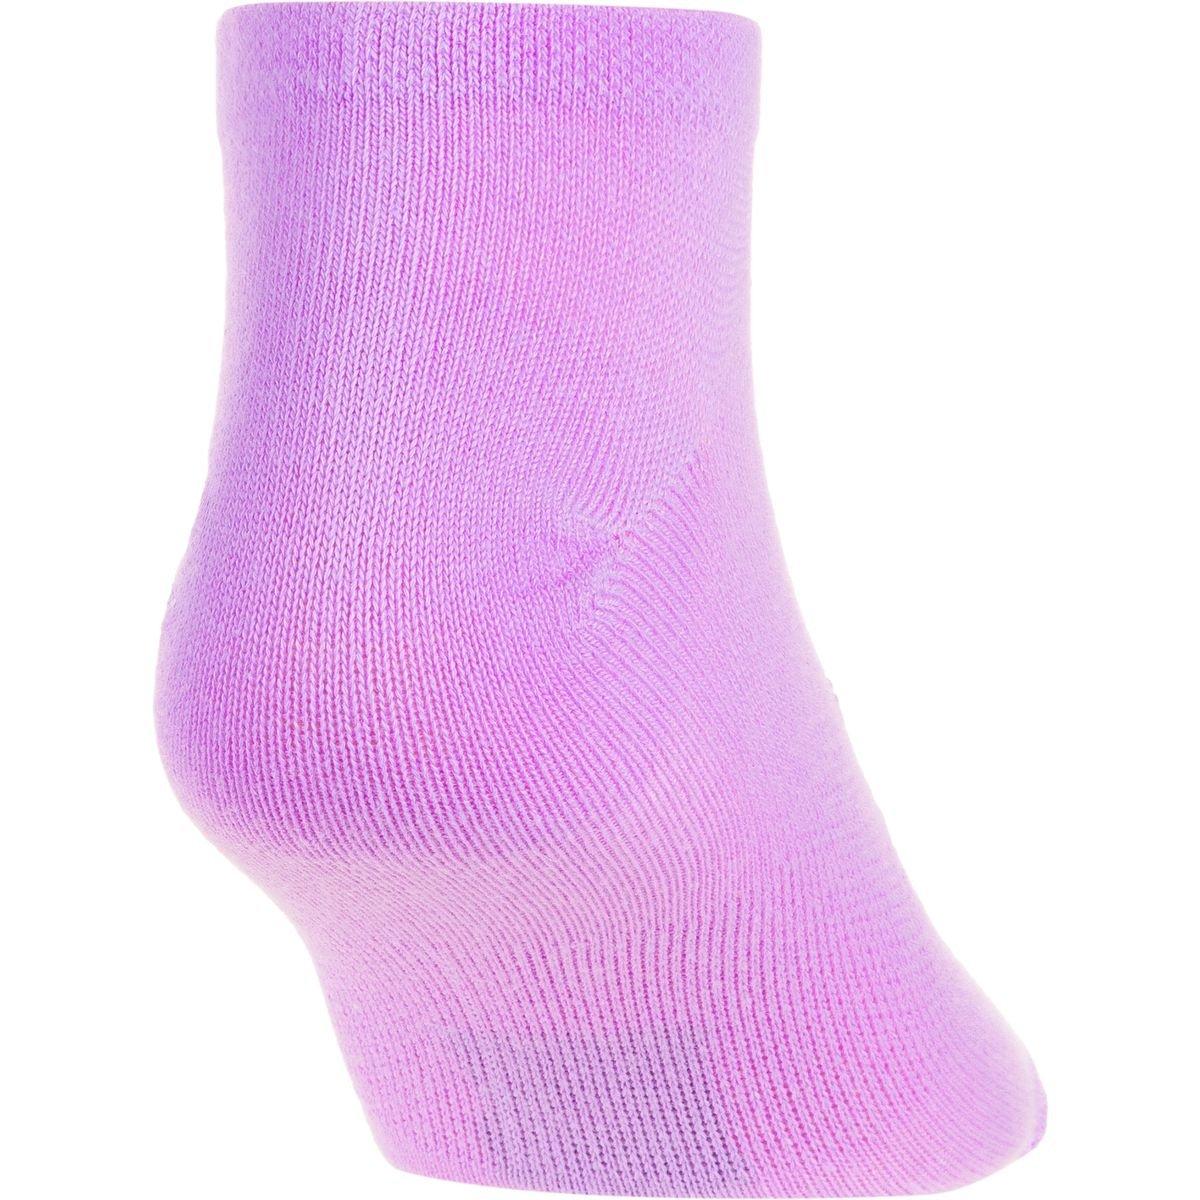 Bright Assortment Medium Under Armour Socks U226W 6 Pairs Under Armour Women`s Big Logo No-Show Socks 6 Pack Under Armour Women/'s Essential No Show Liner Socks